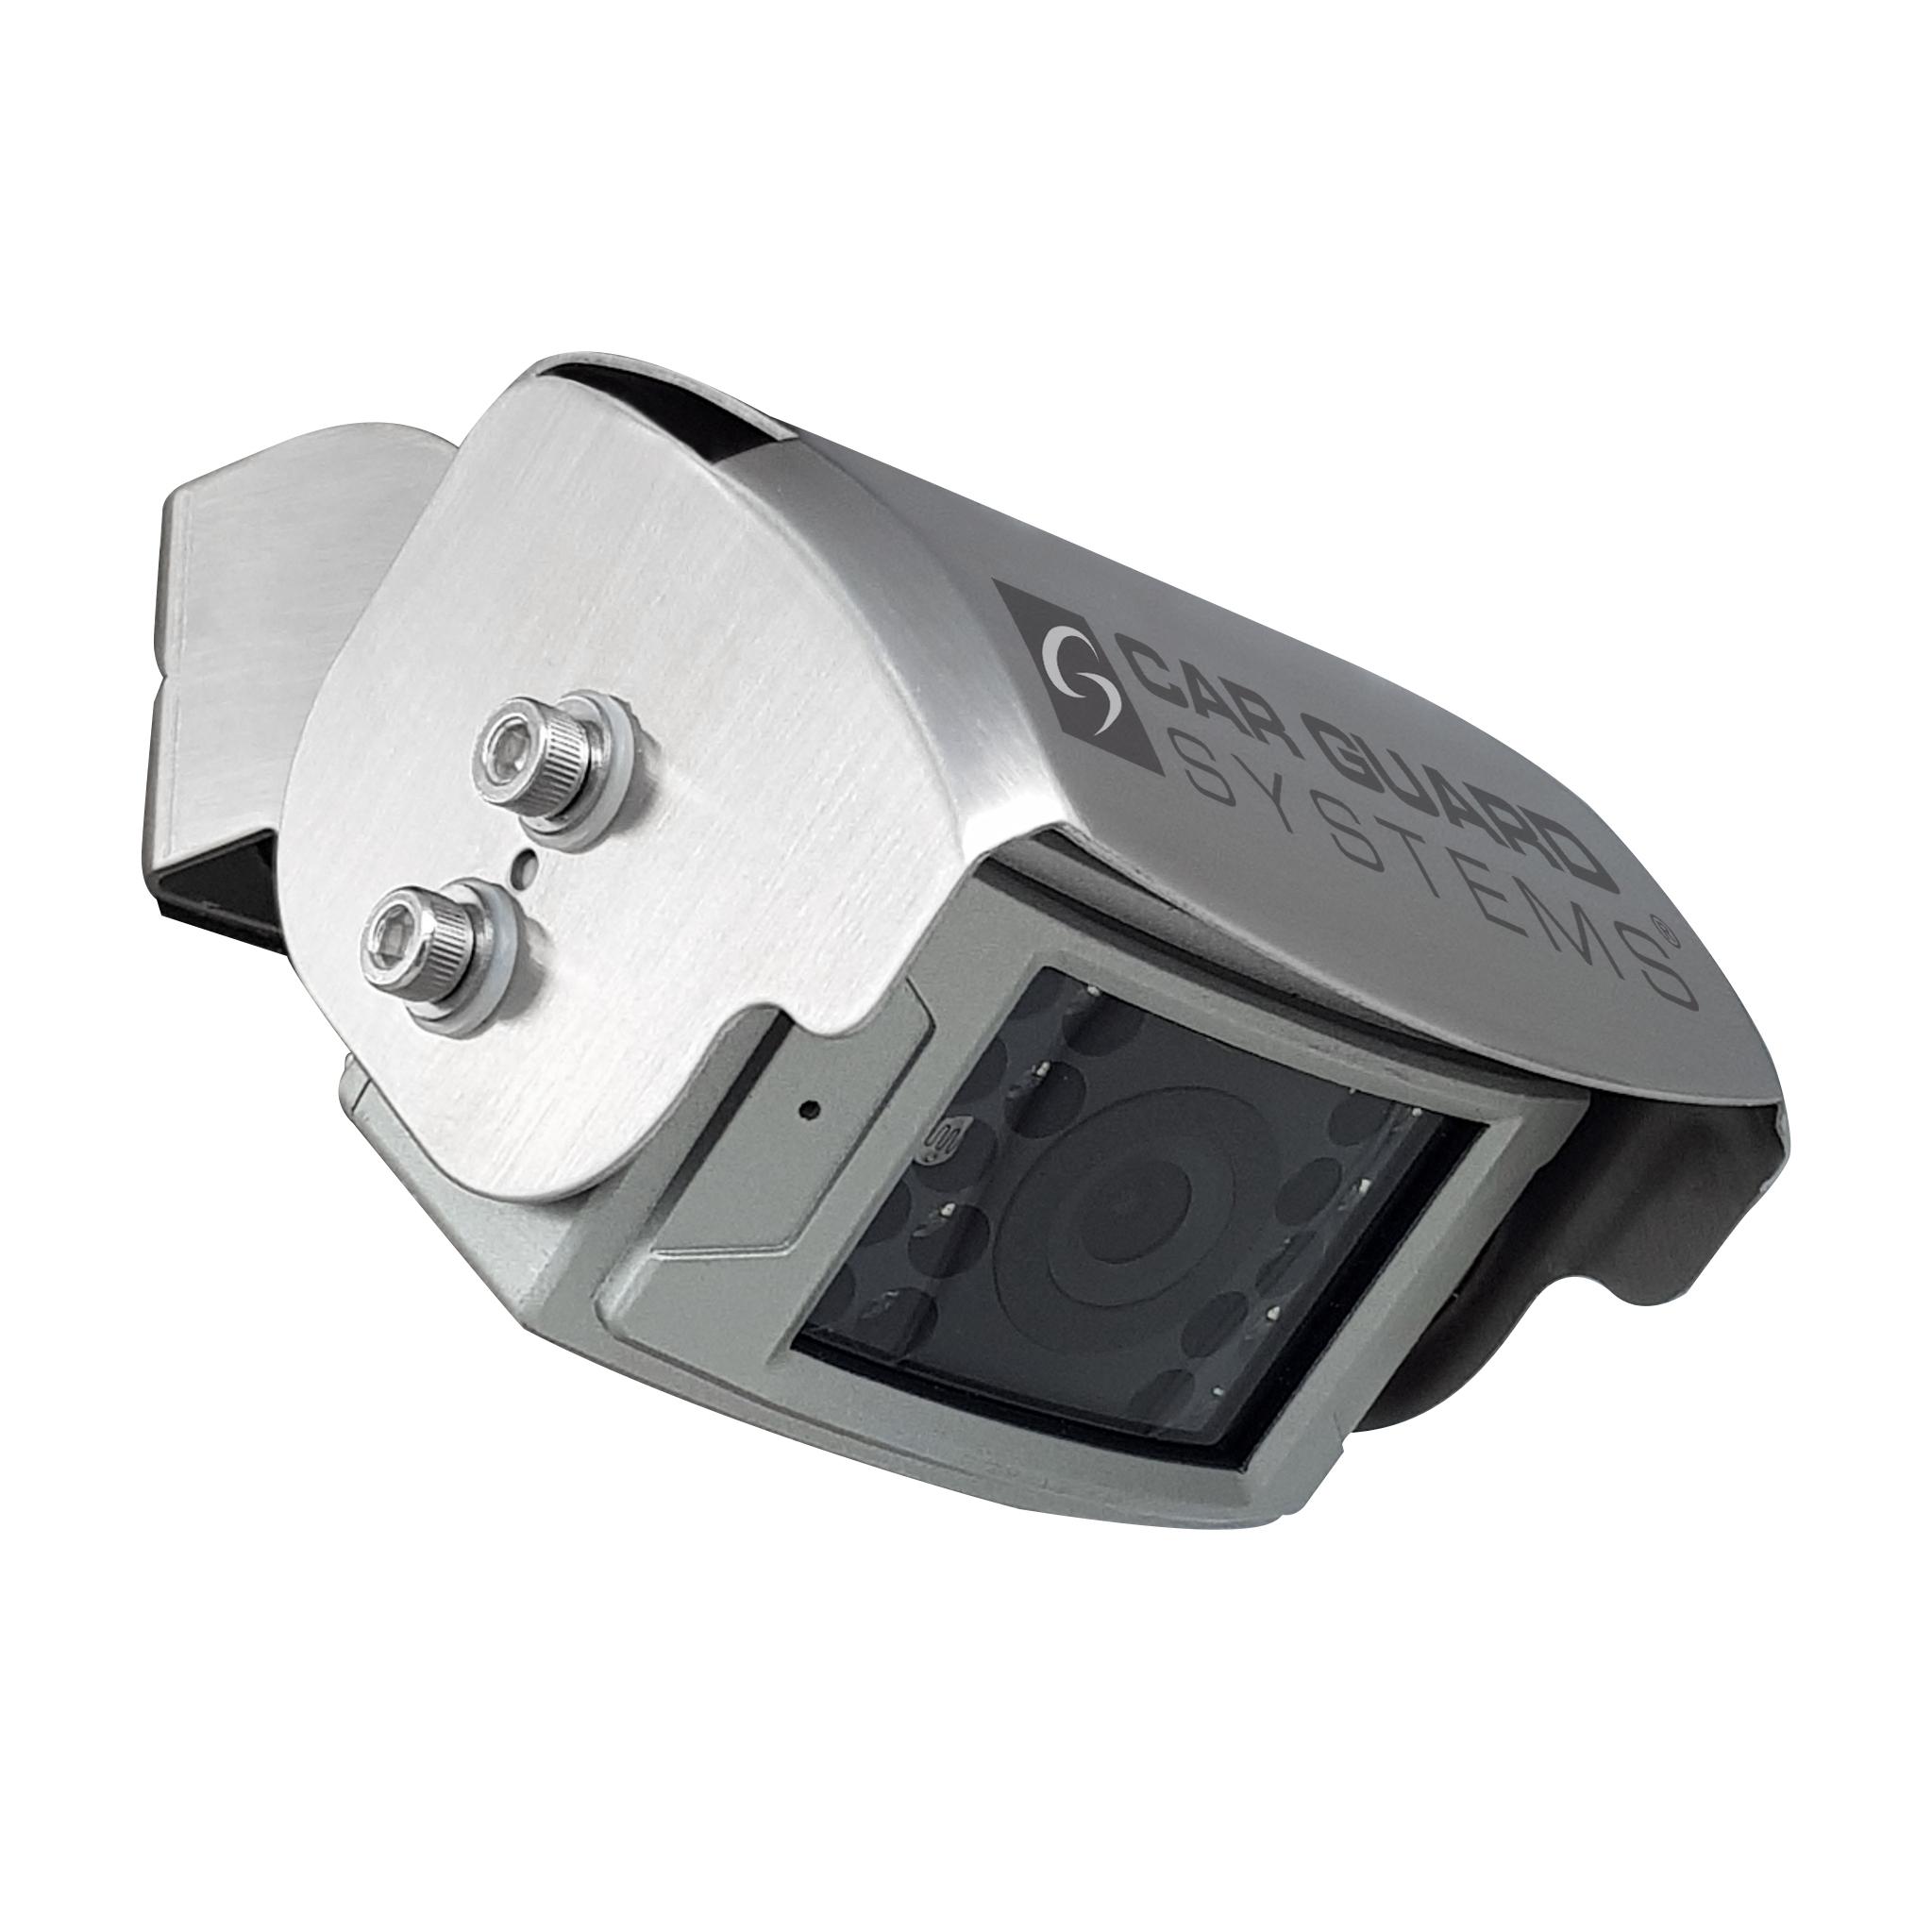 RAV-F rear view camera, full HD for AHD monitors, 115°, silver, 9-32V, PAL